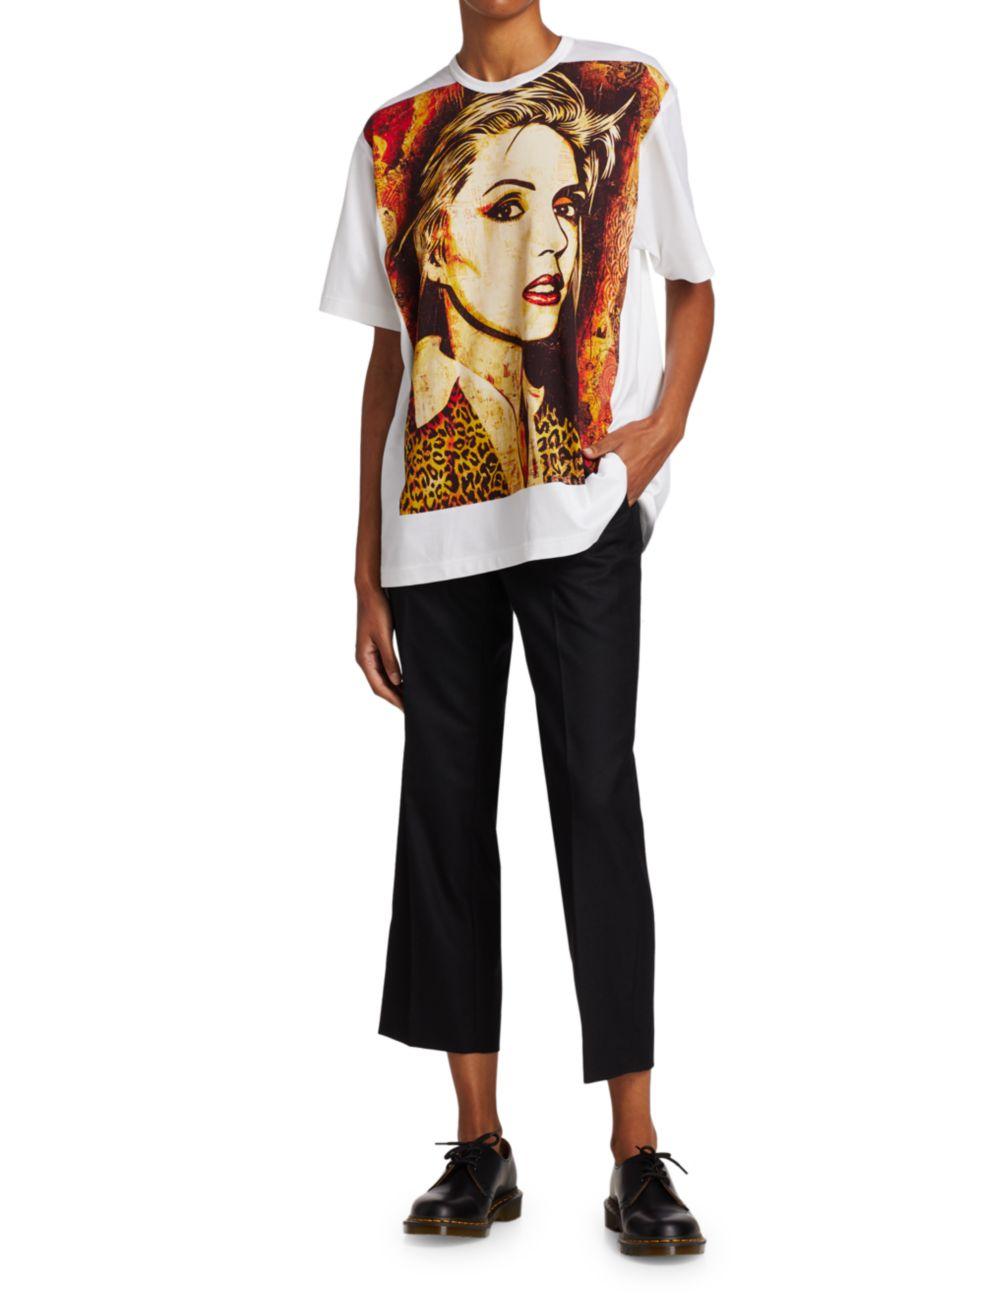 Junya Watanabe Debbie Harry Graphic T-Shirt   SaksFifthAvenue